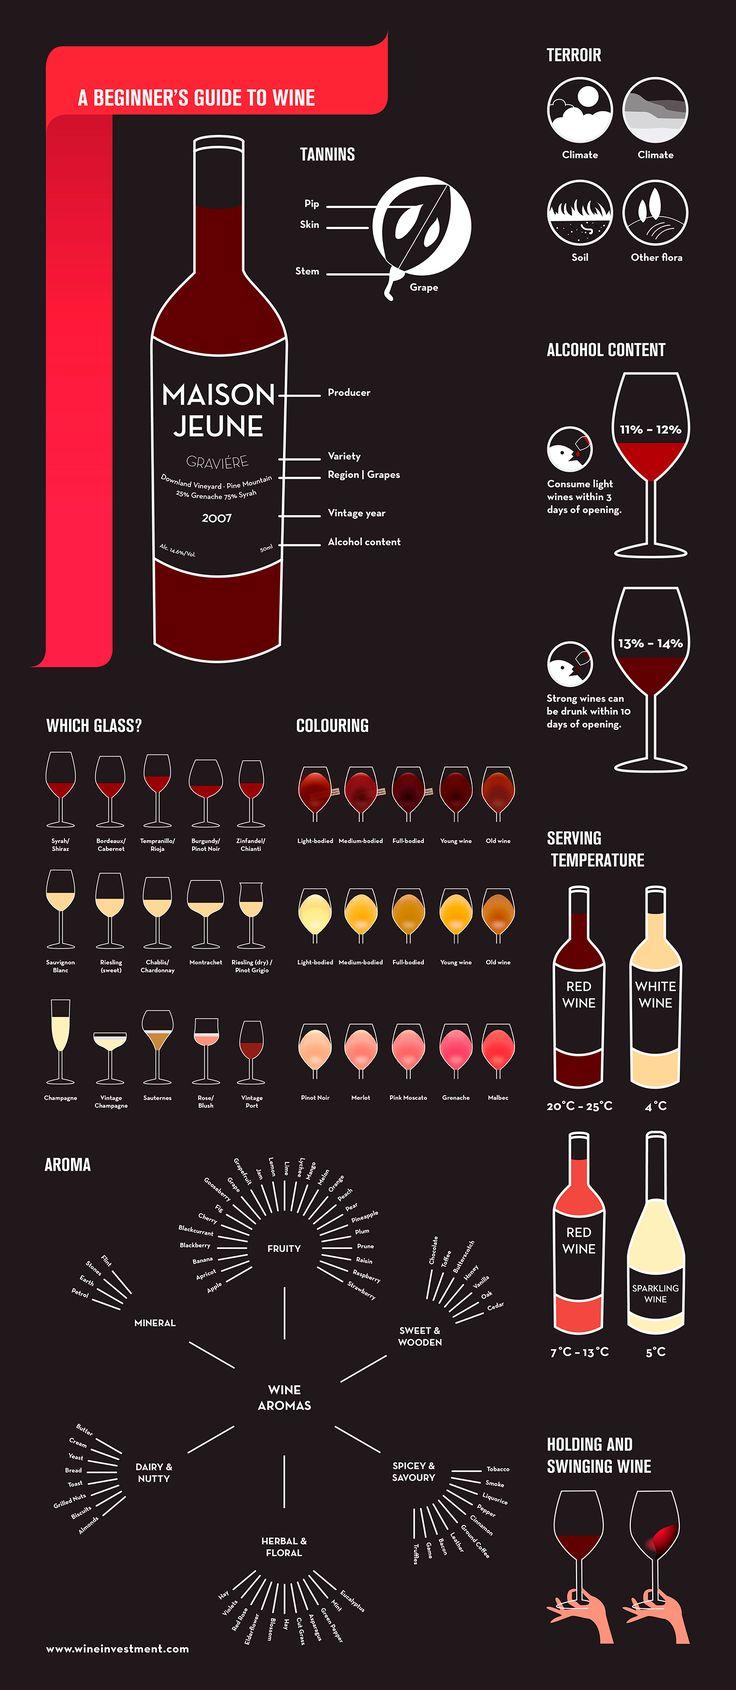 The Beginner's Guide To Wine - Design - ShortList Magazine